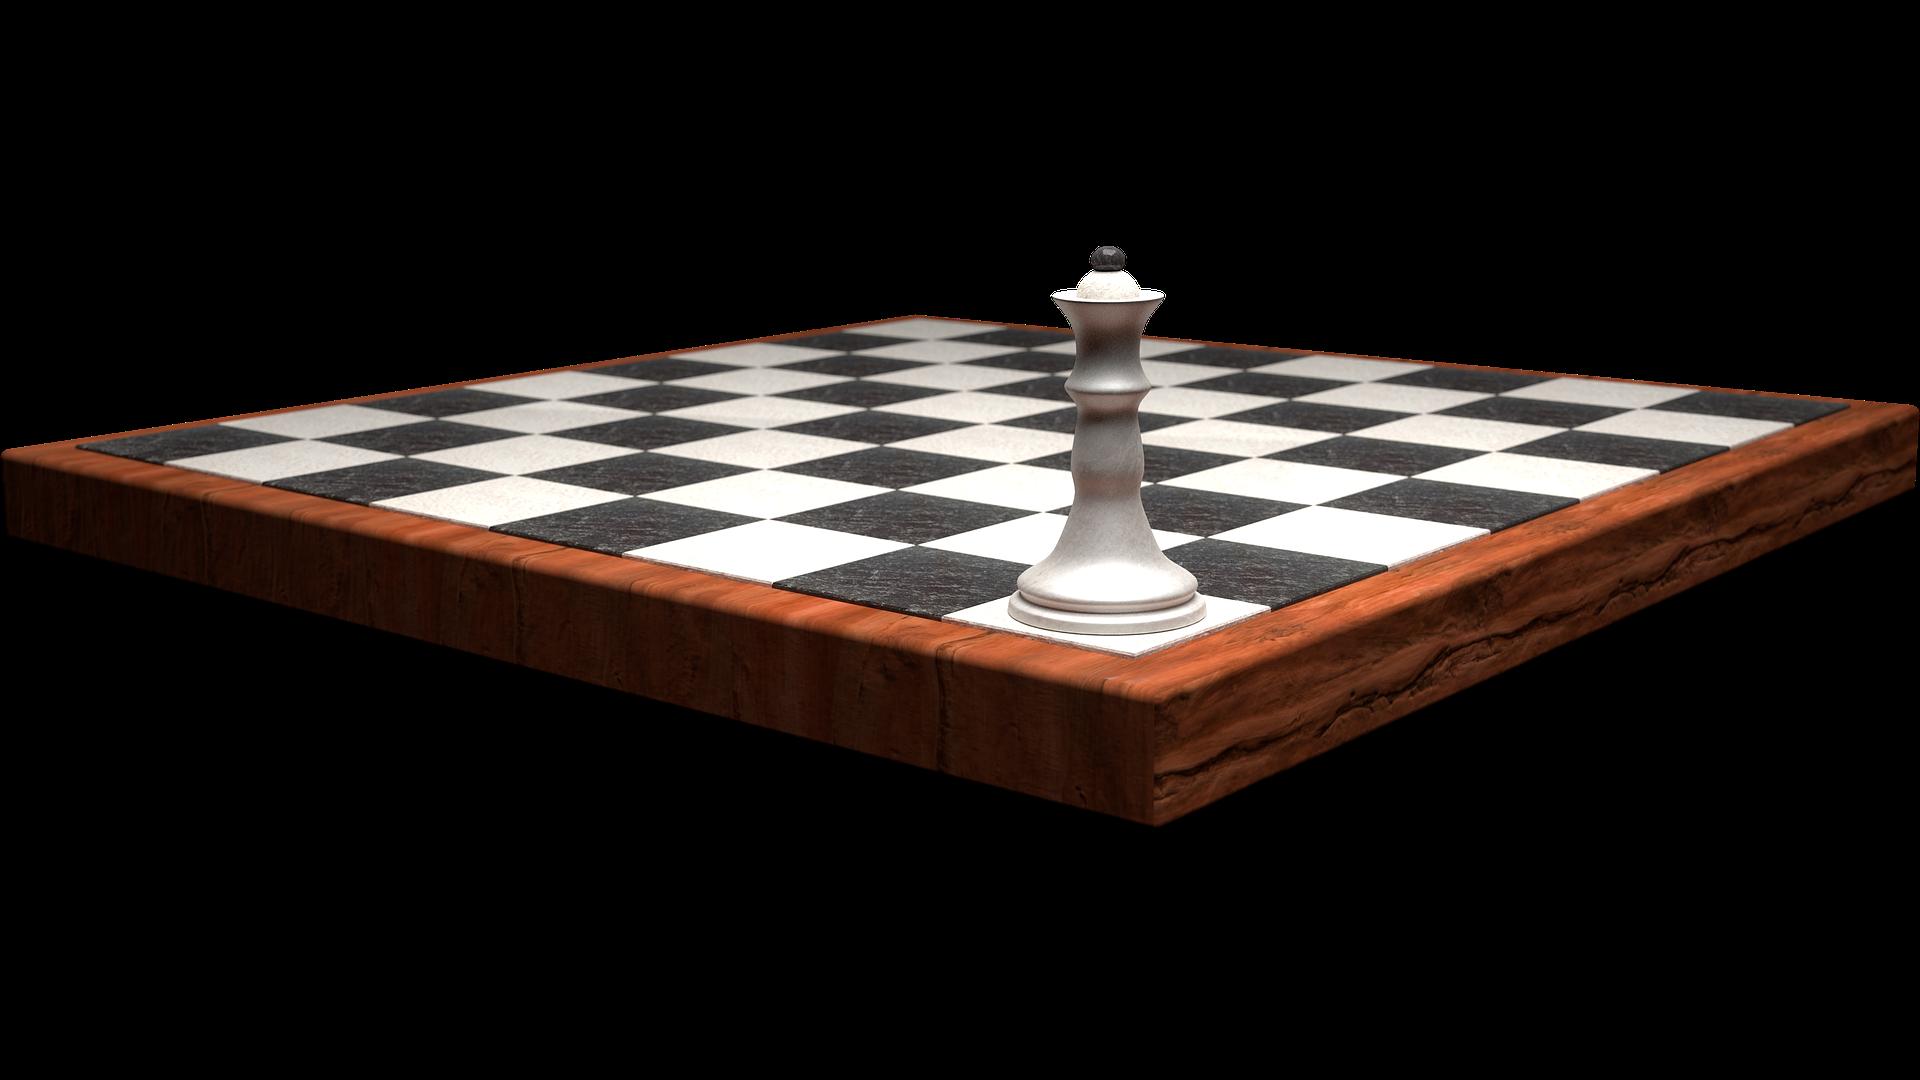 Solo Chess